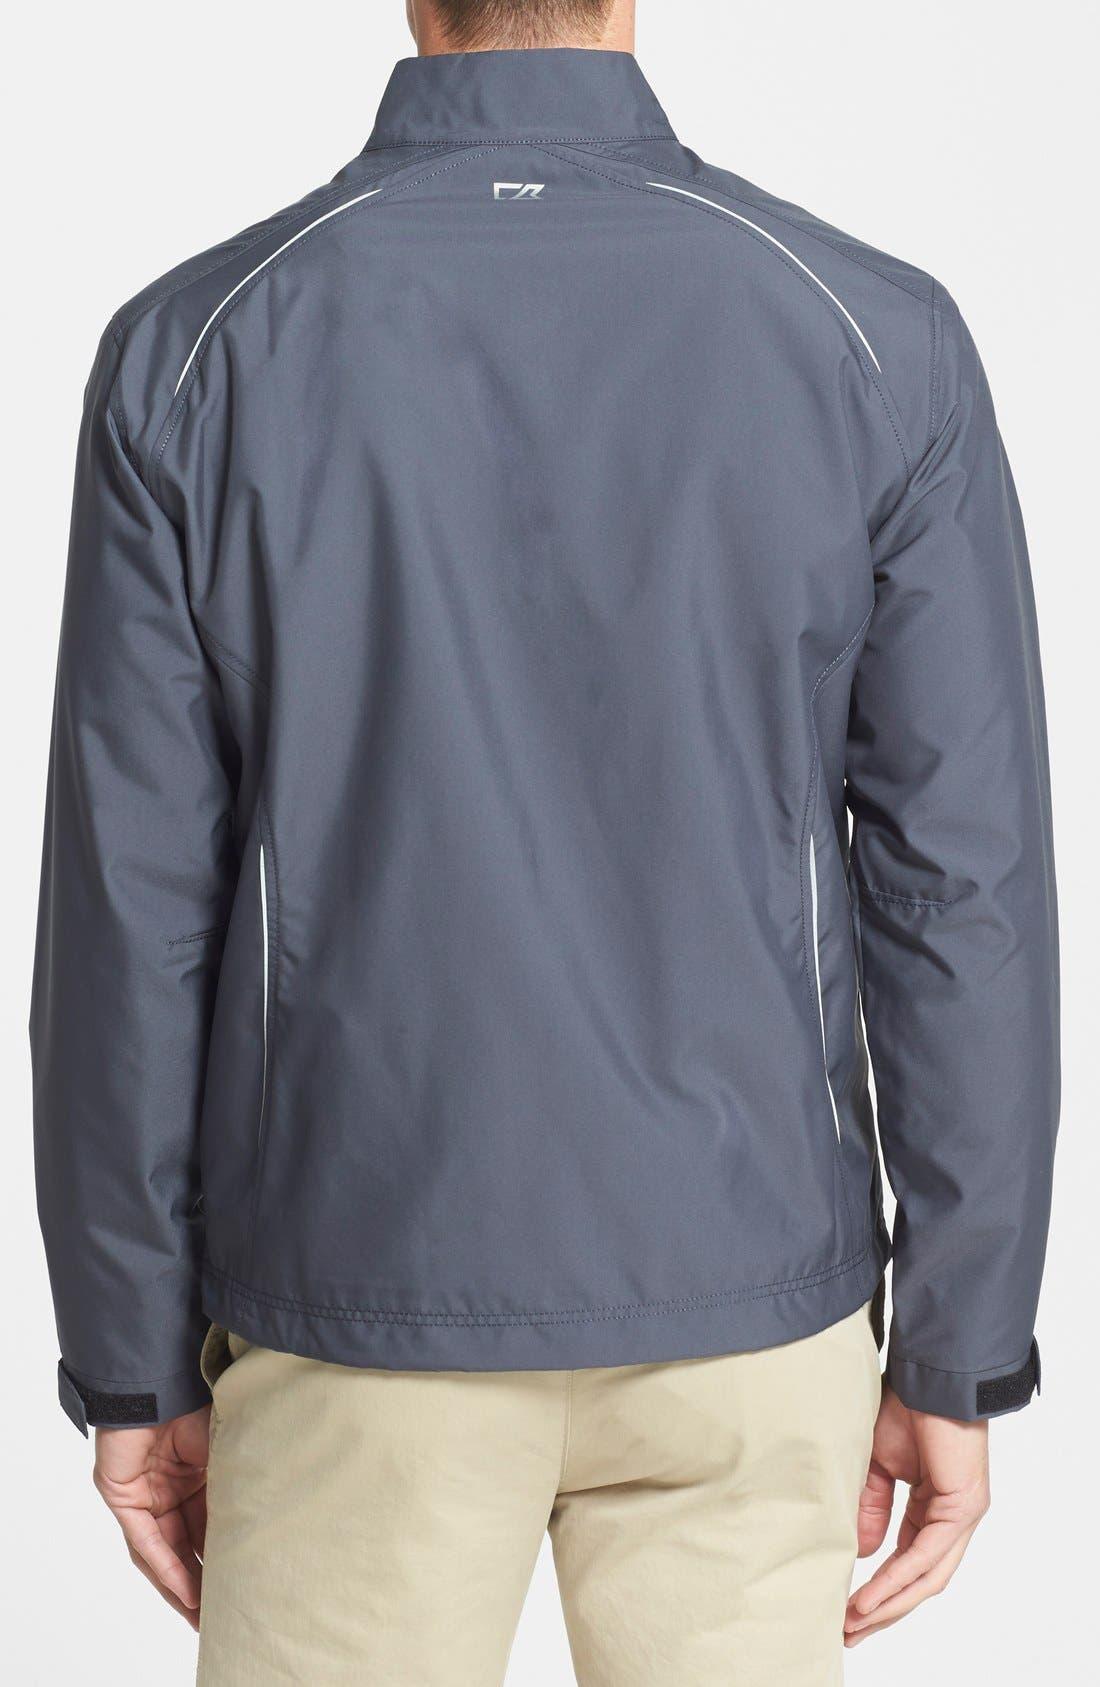 CUTTER & BUCK, Beacon WeatherTec Wind & Water Resistant Jacket, Alternate thumbnail 5, color, ONYX GREY